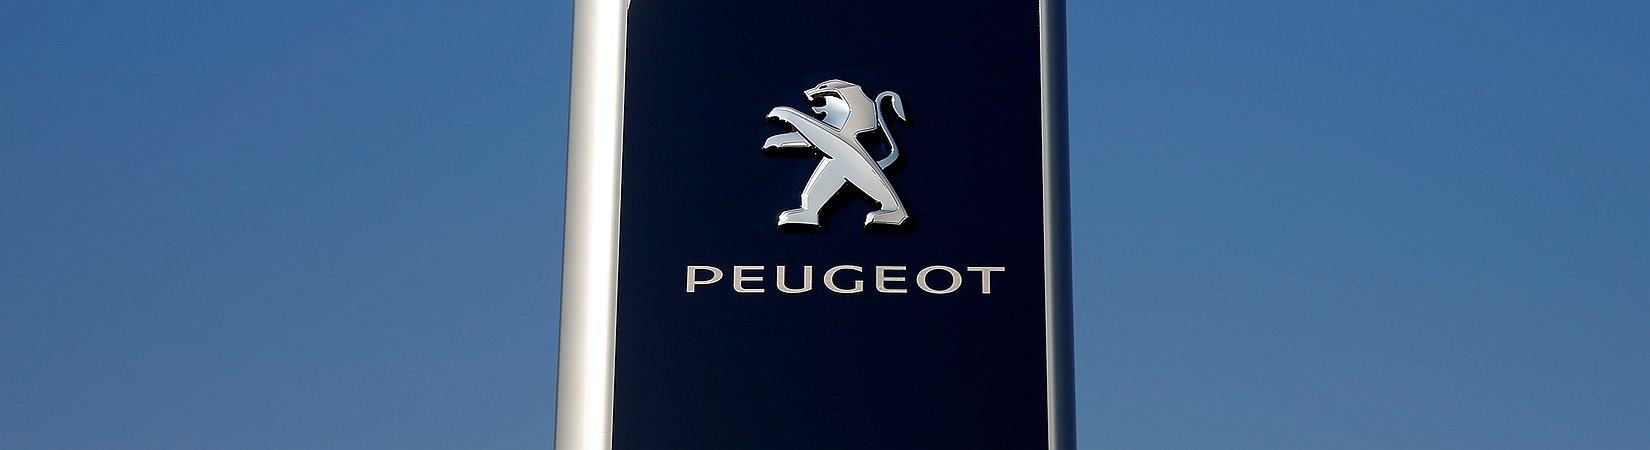 General Motors vuole vendere Opel a Peugeot